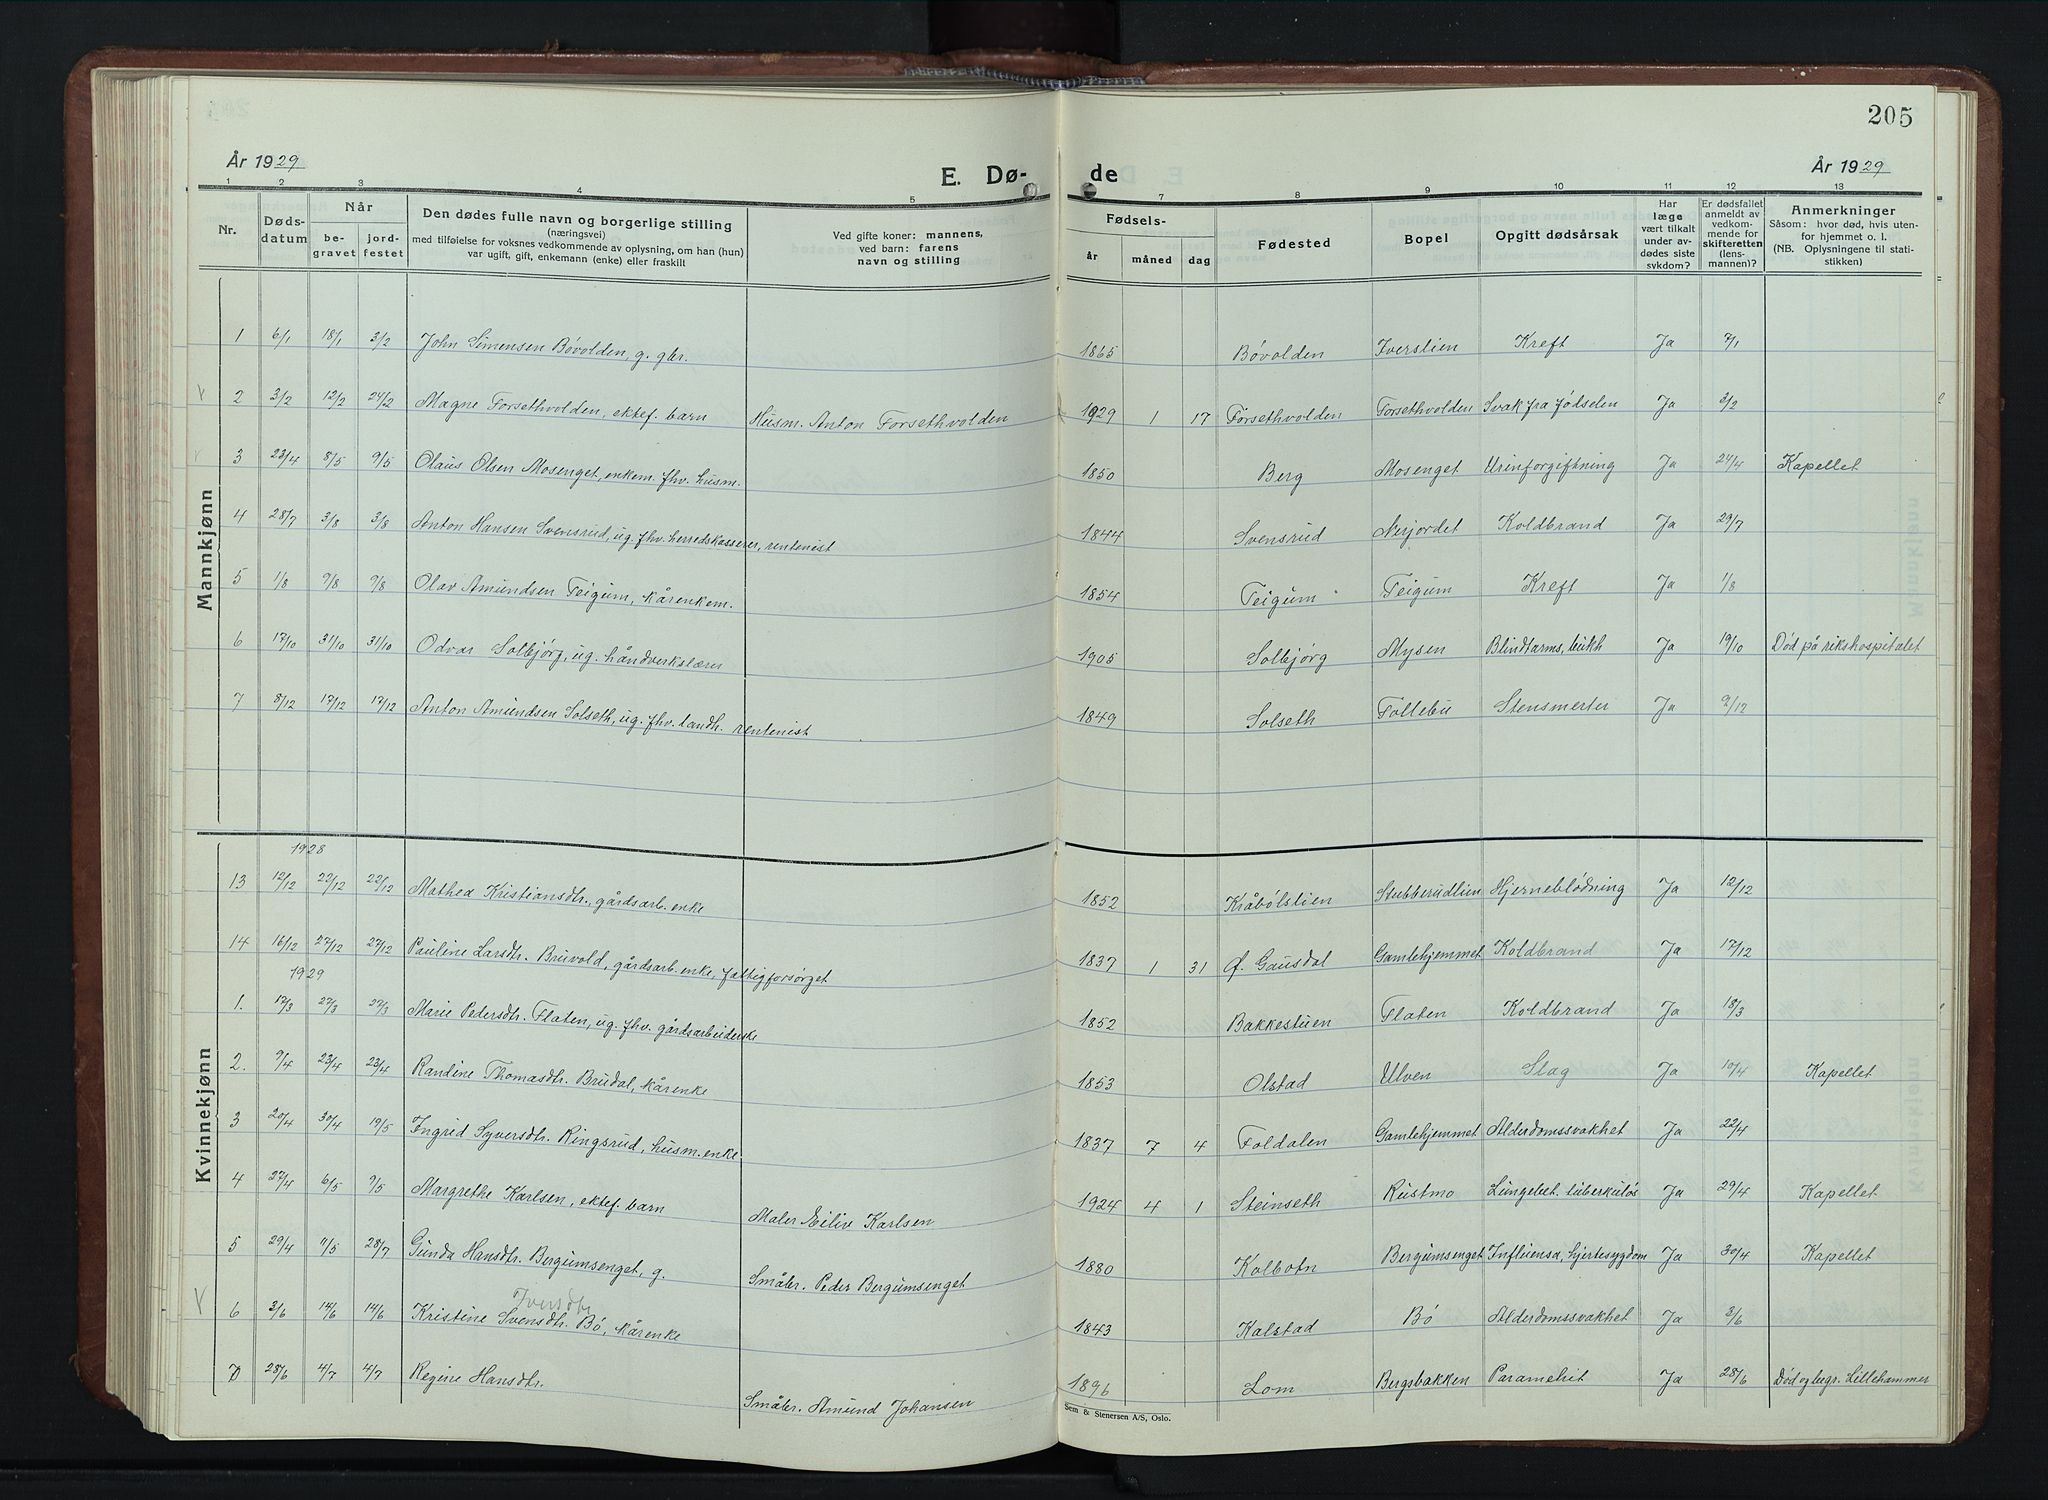 SAH, Vestre Gausdal prestekontor, Klokkerbok nr. 5, 1926-1955, s. 205